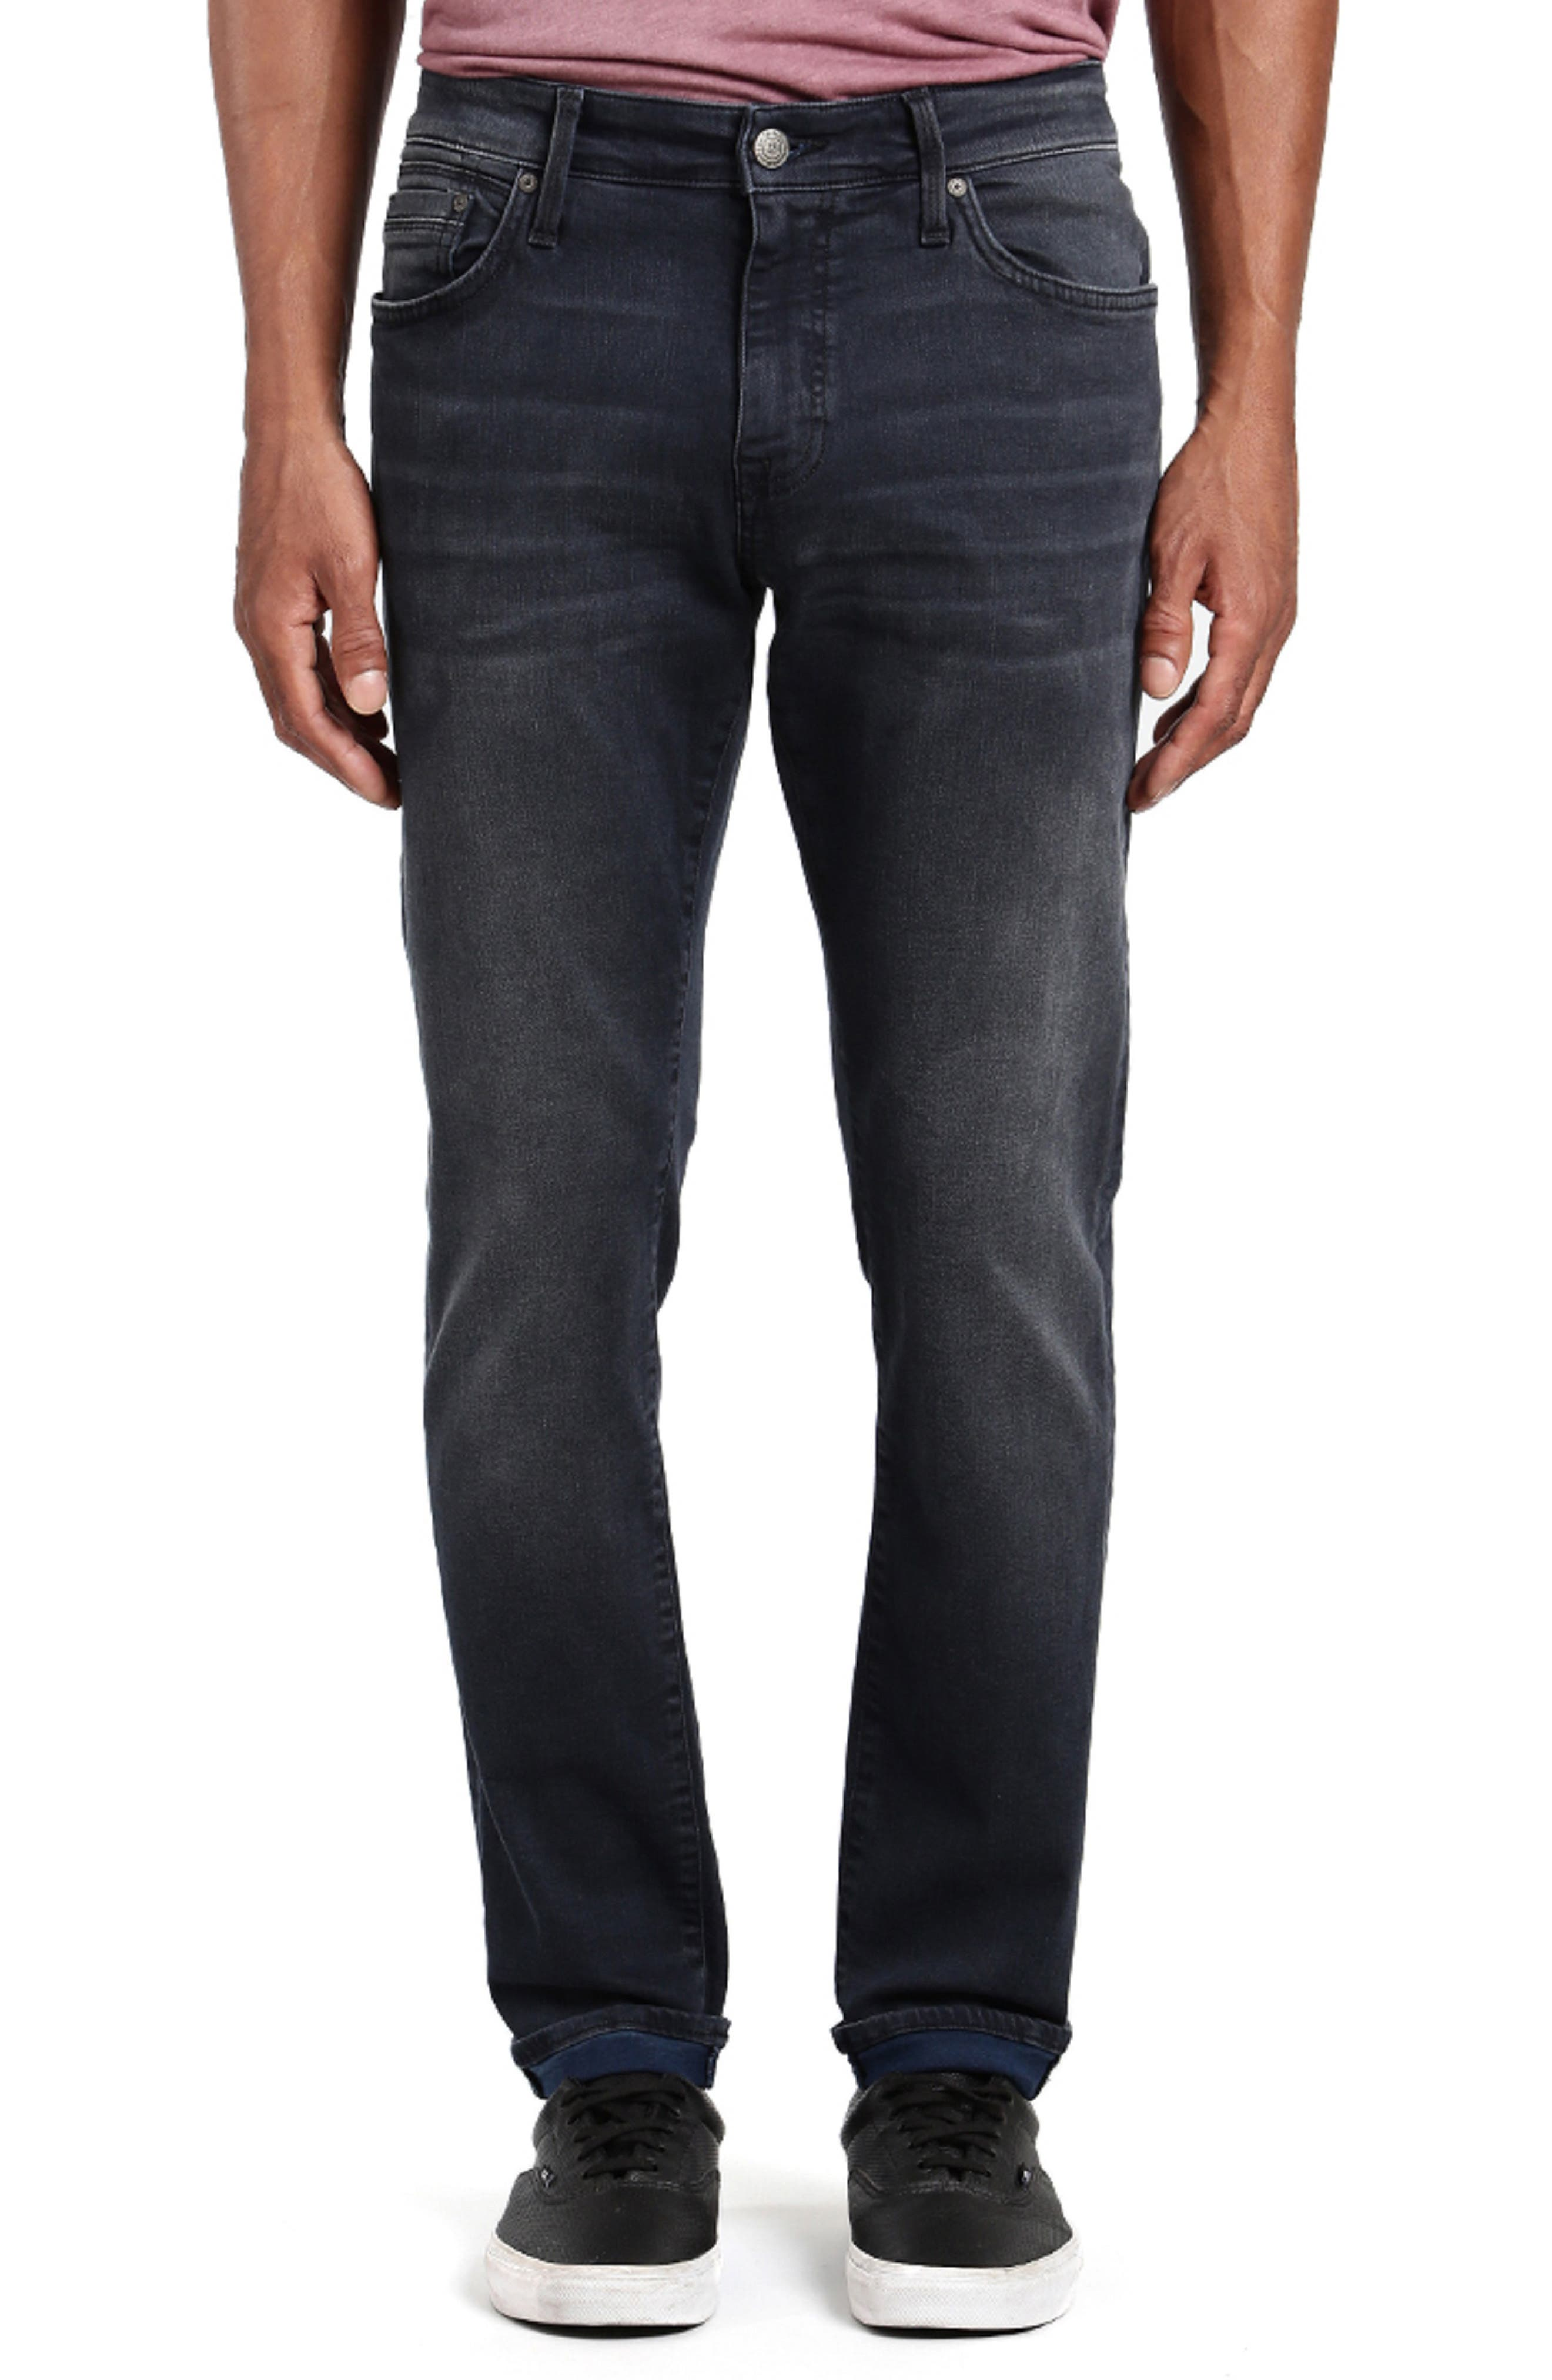 MAVI JEANS James Skinny Fit Jeans in Shaded Blue Williamsburg